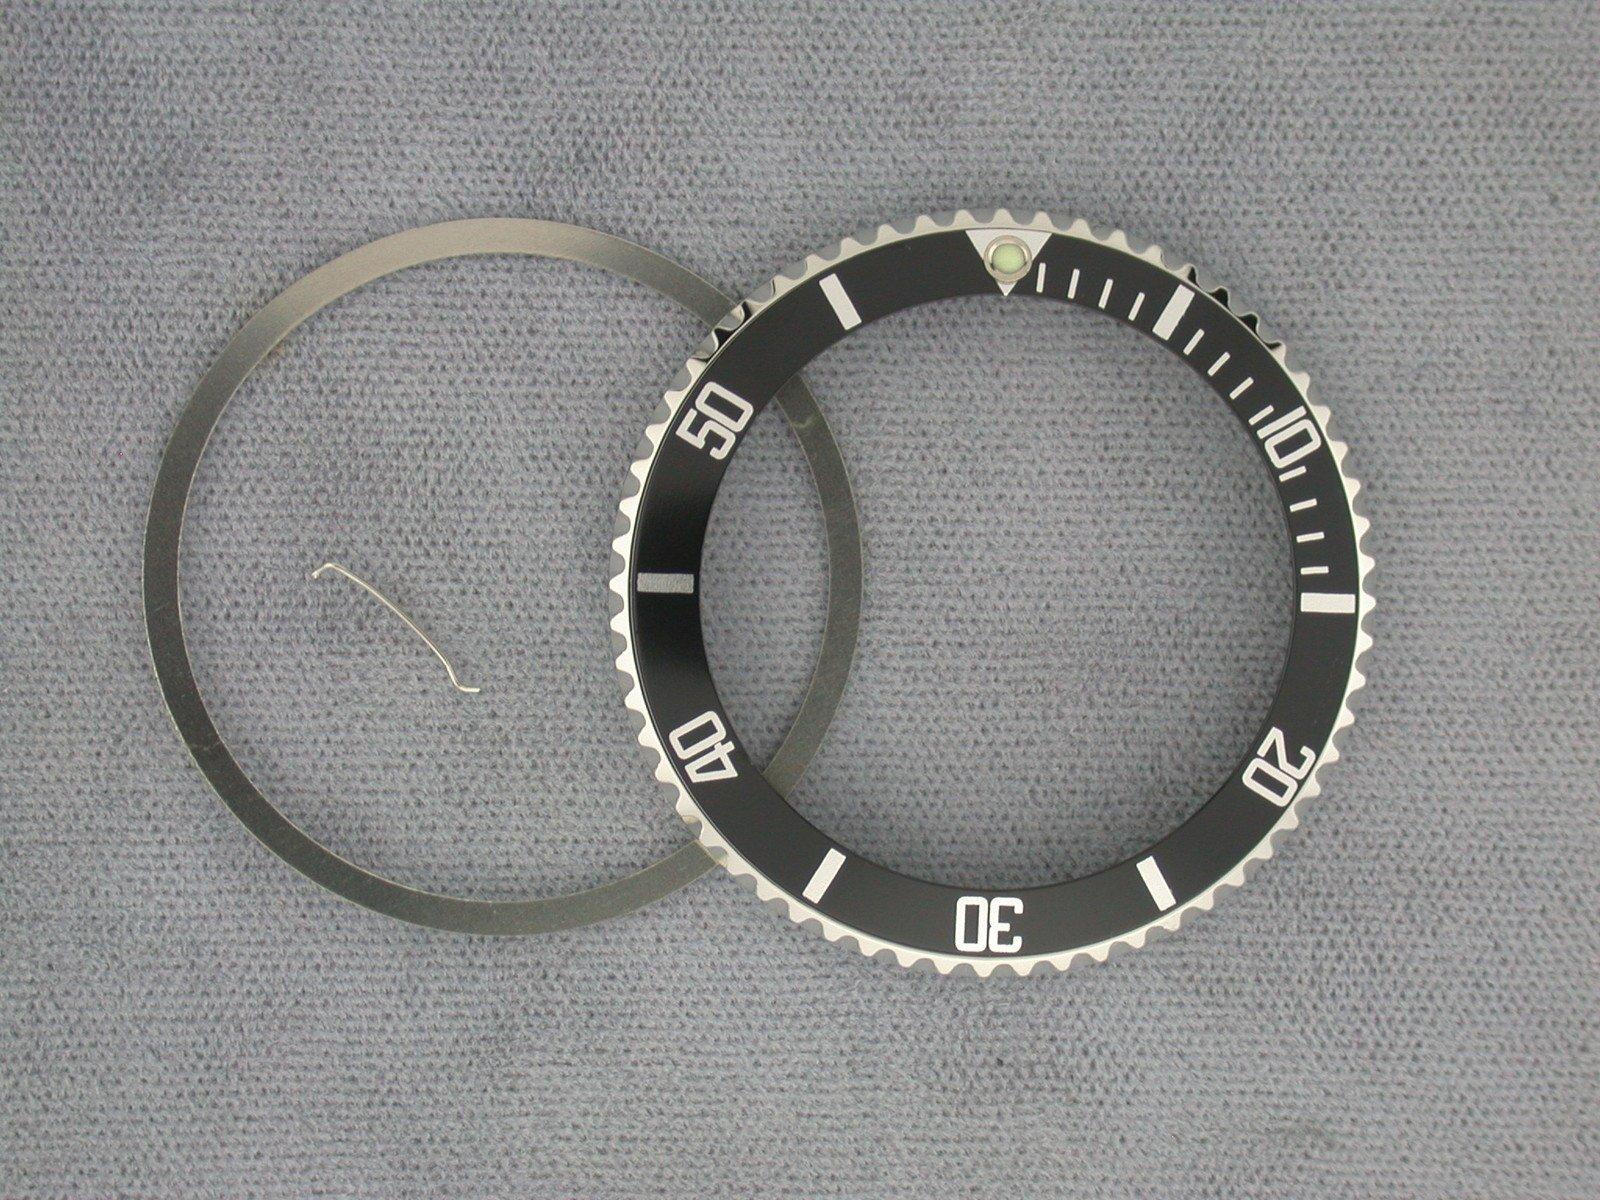 Bezel & Insert for Rolex No Date Submariner # 14060 Black